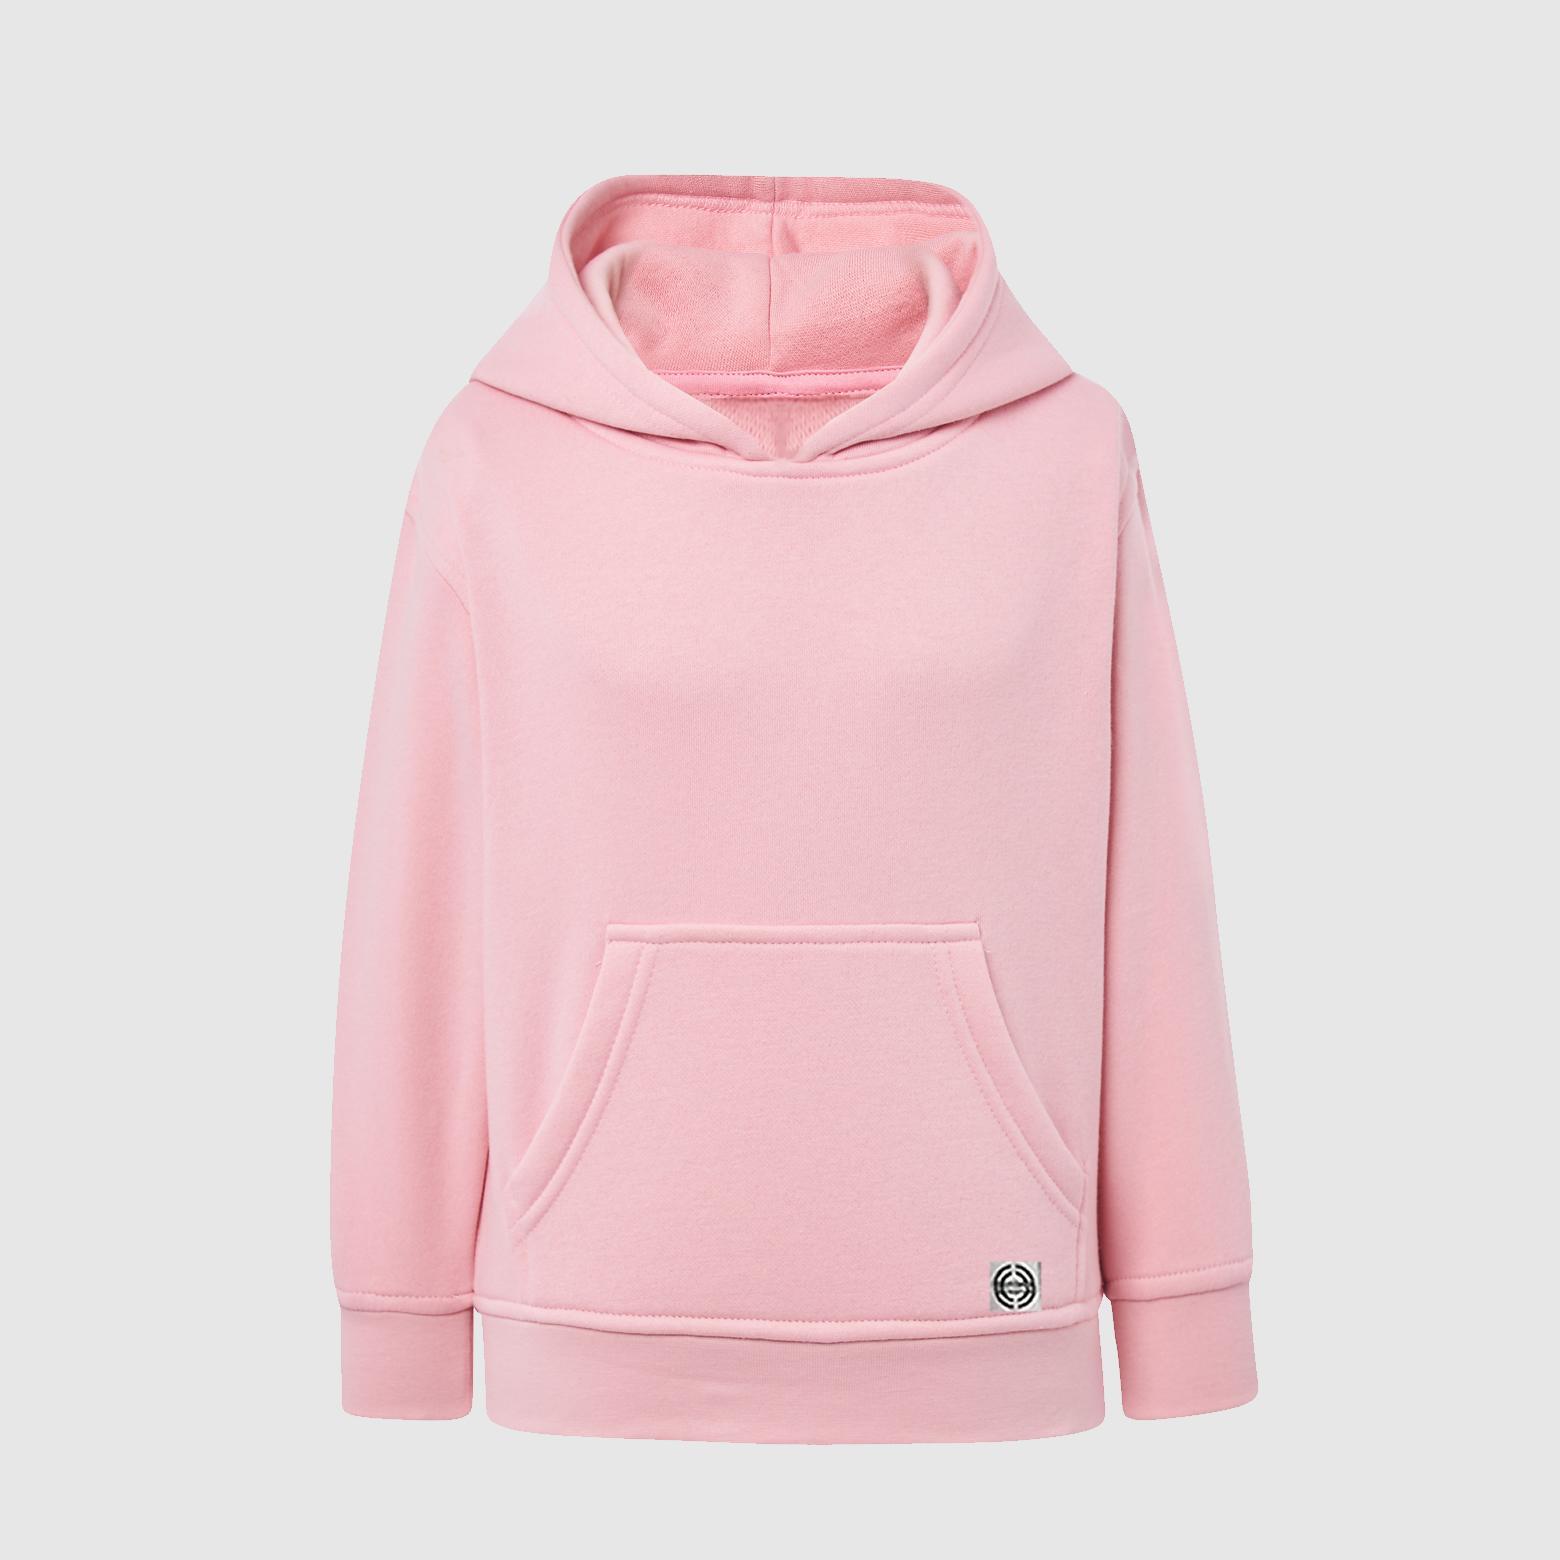 "Sudadera capucha clásica ""inicial grande"" niñ@ color rosa."